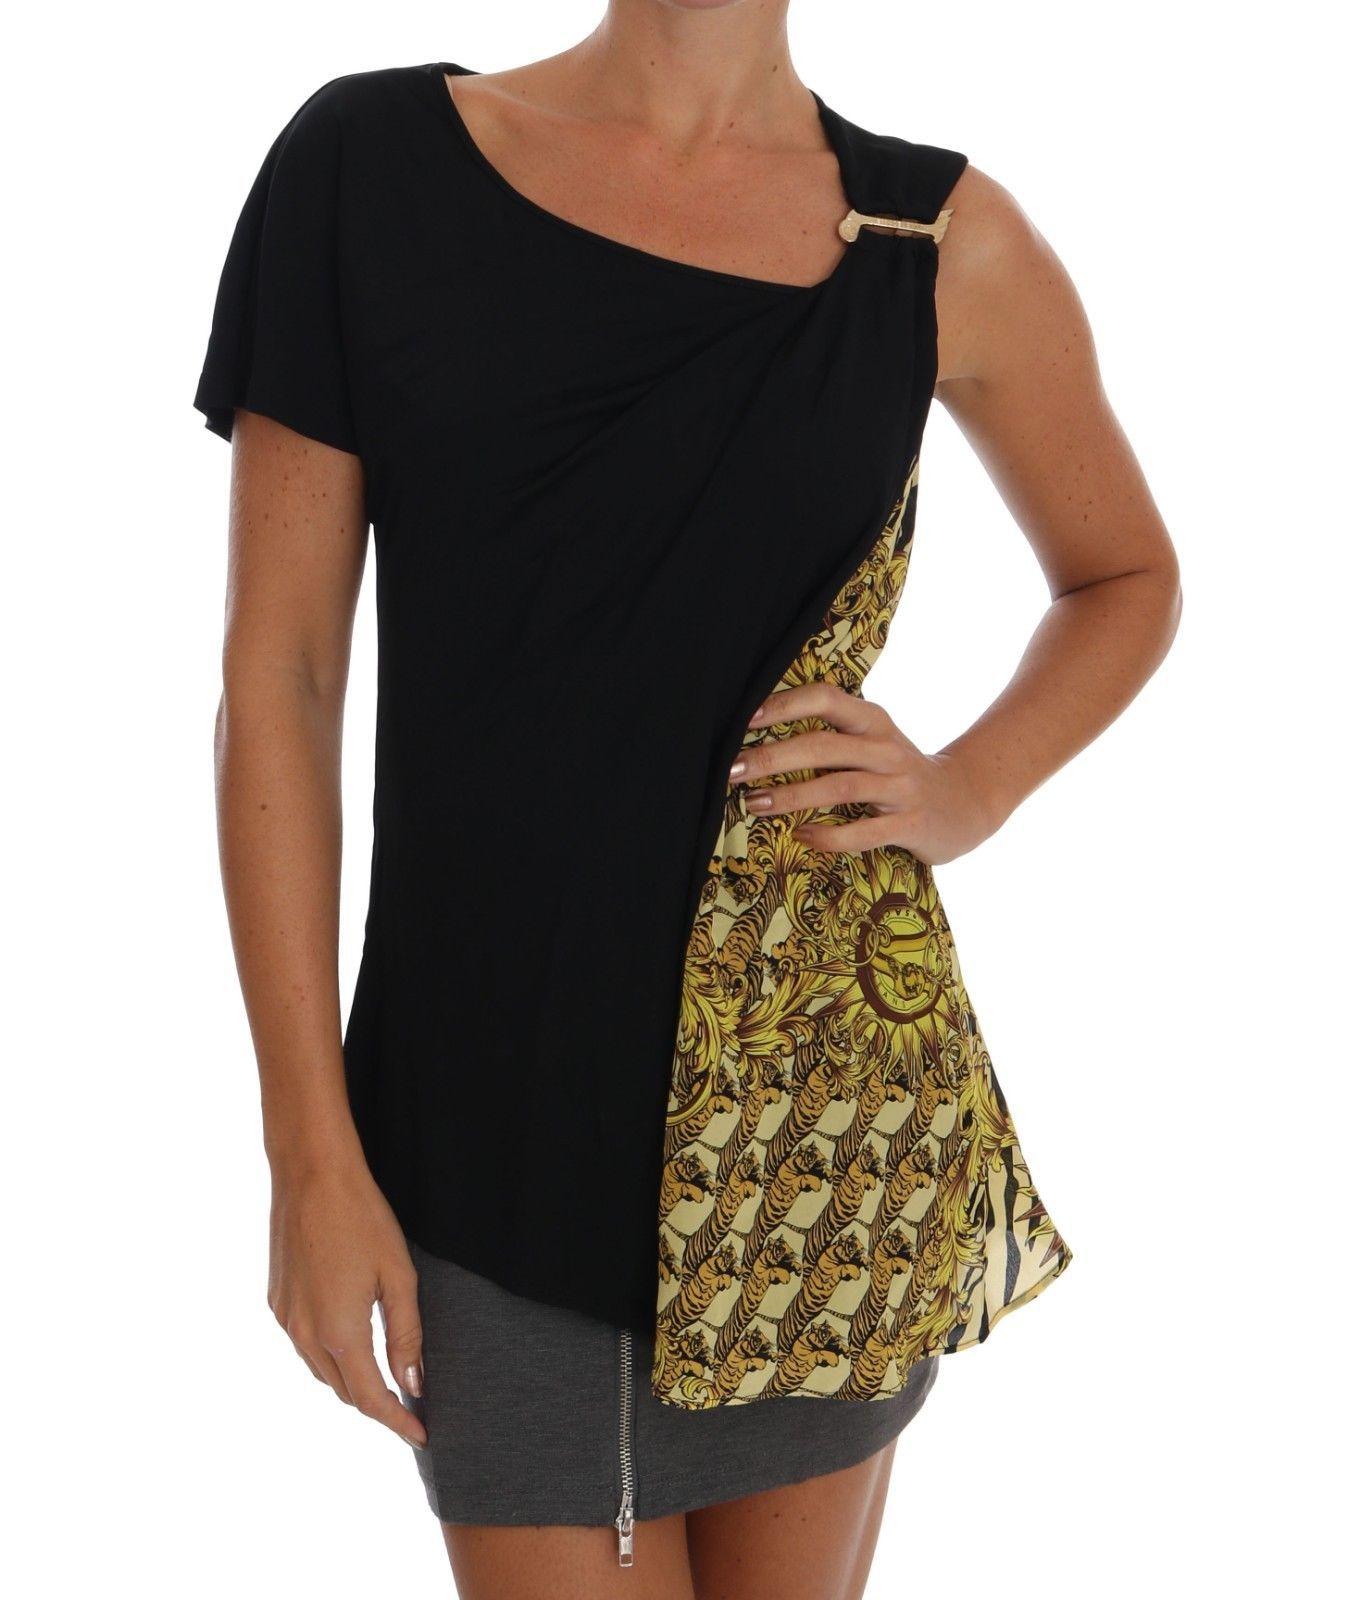 be0bb2dbc369 159.00 | NEW $260 VERSACE JEANS VJ T-Shirt Blouse Top Black Gold Silk  Baroque IT40/ US4/S ❤ #versace #jeans #shirt #blouse #black #gold #silk # baroque ...